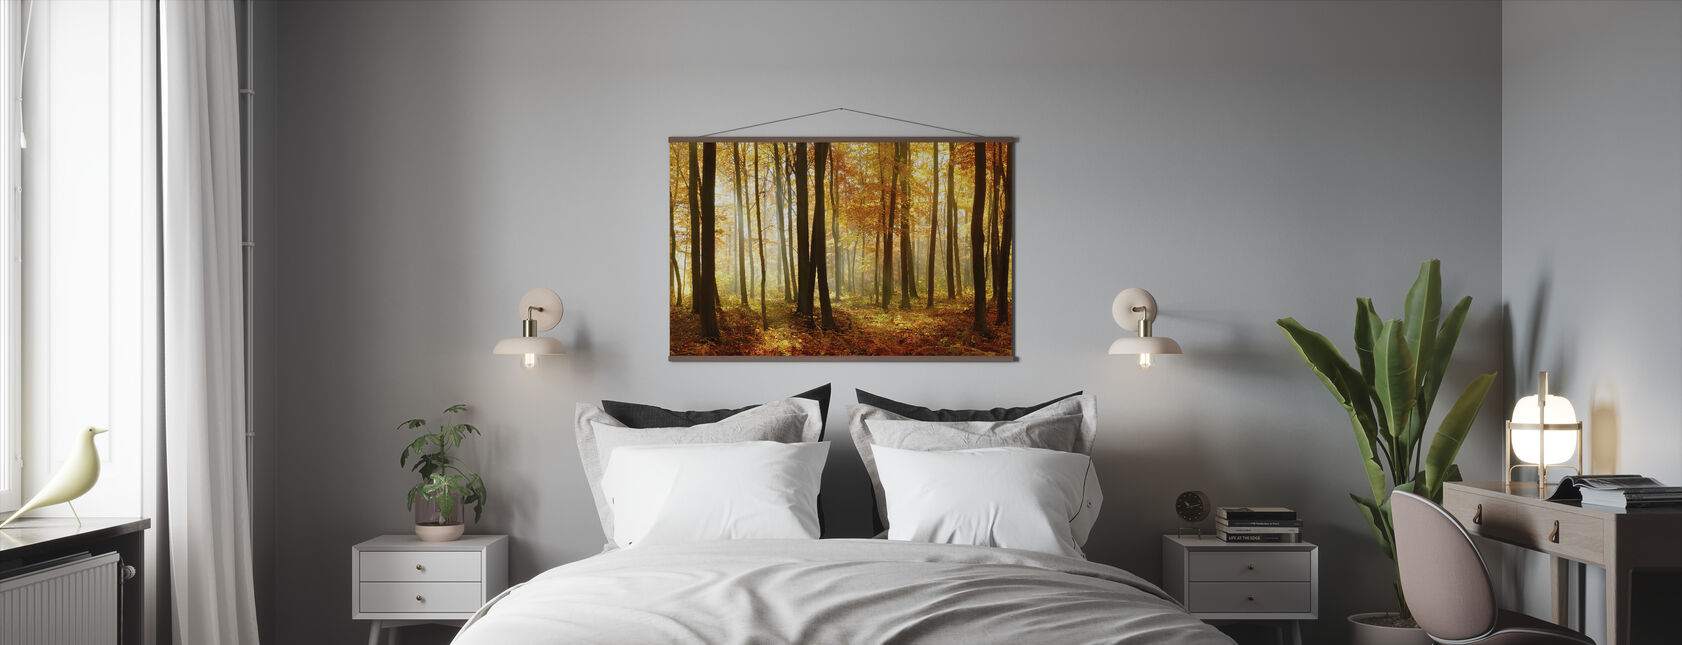 Japansk skov - Plakat - Soveværelse